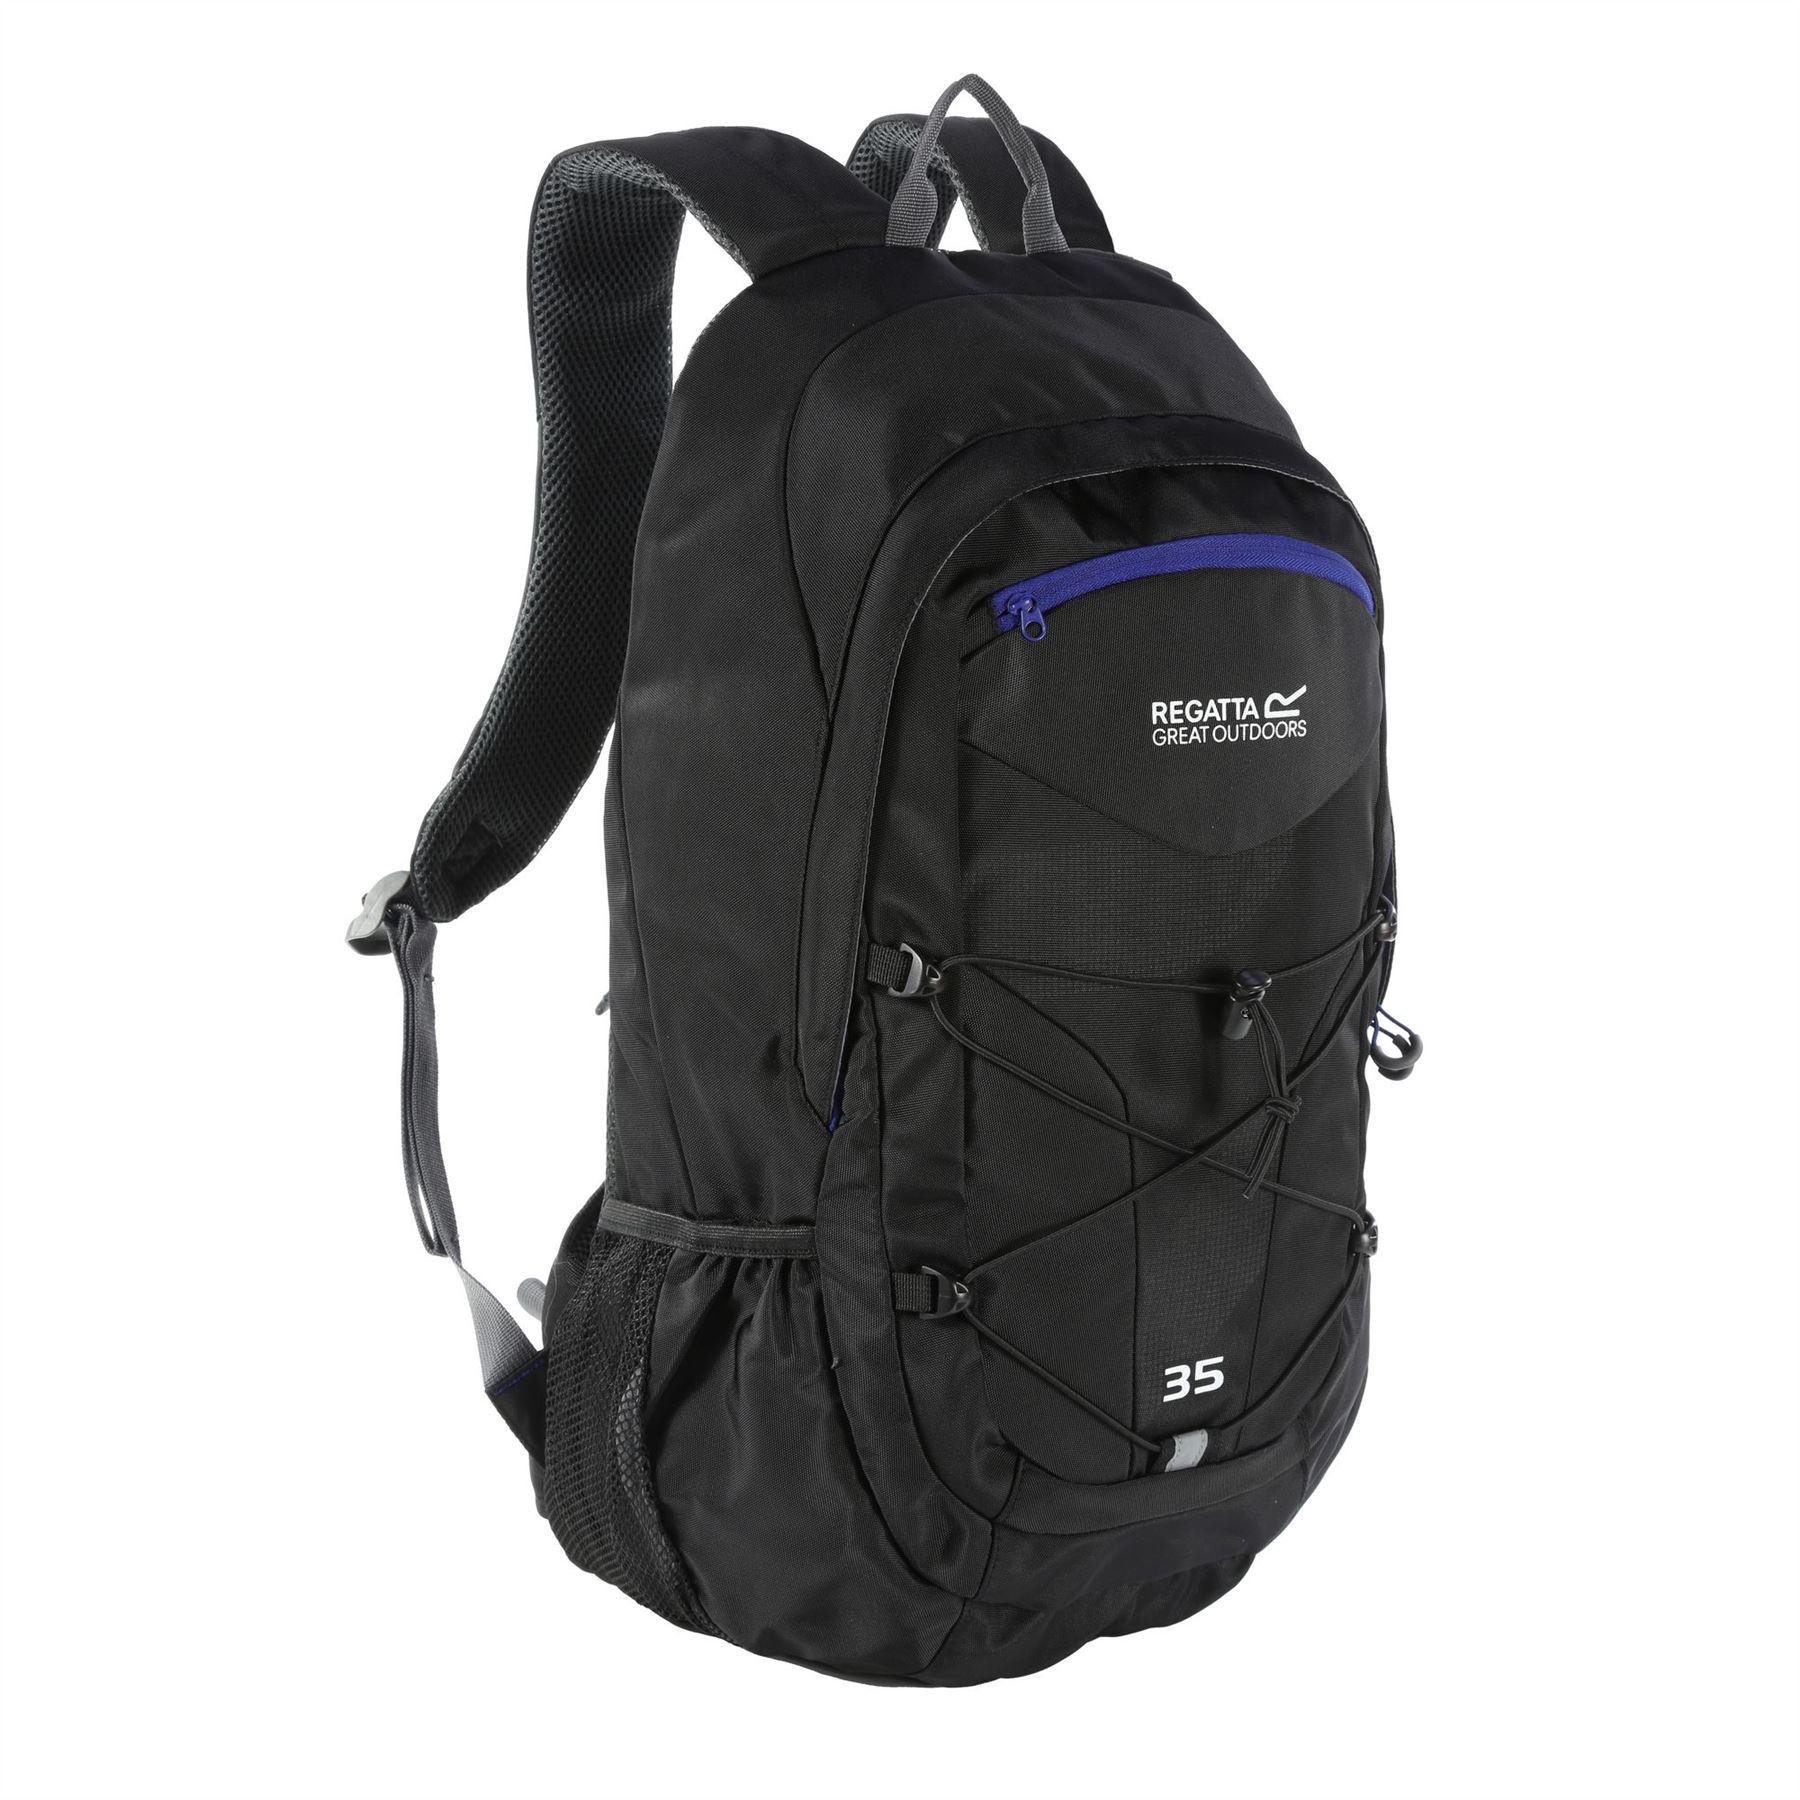 miniatuur 3 - Regatta Atholl II 35 Litre Walking Backpack Rucksack Mens Womens Hiking Travel